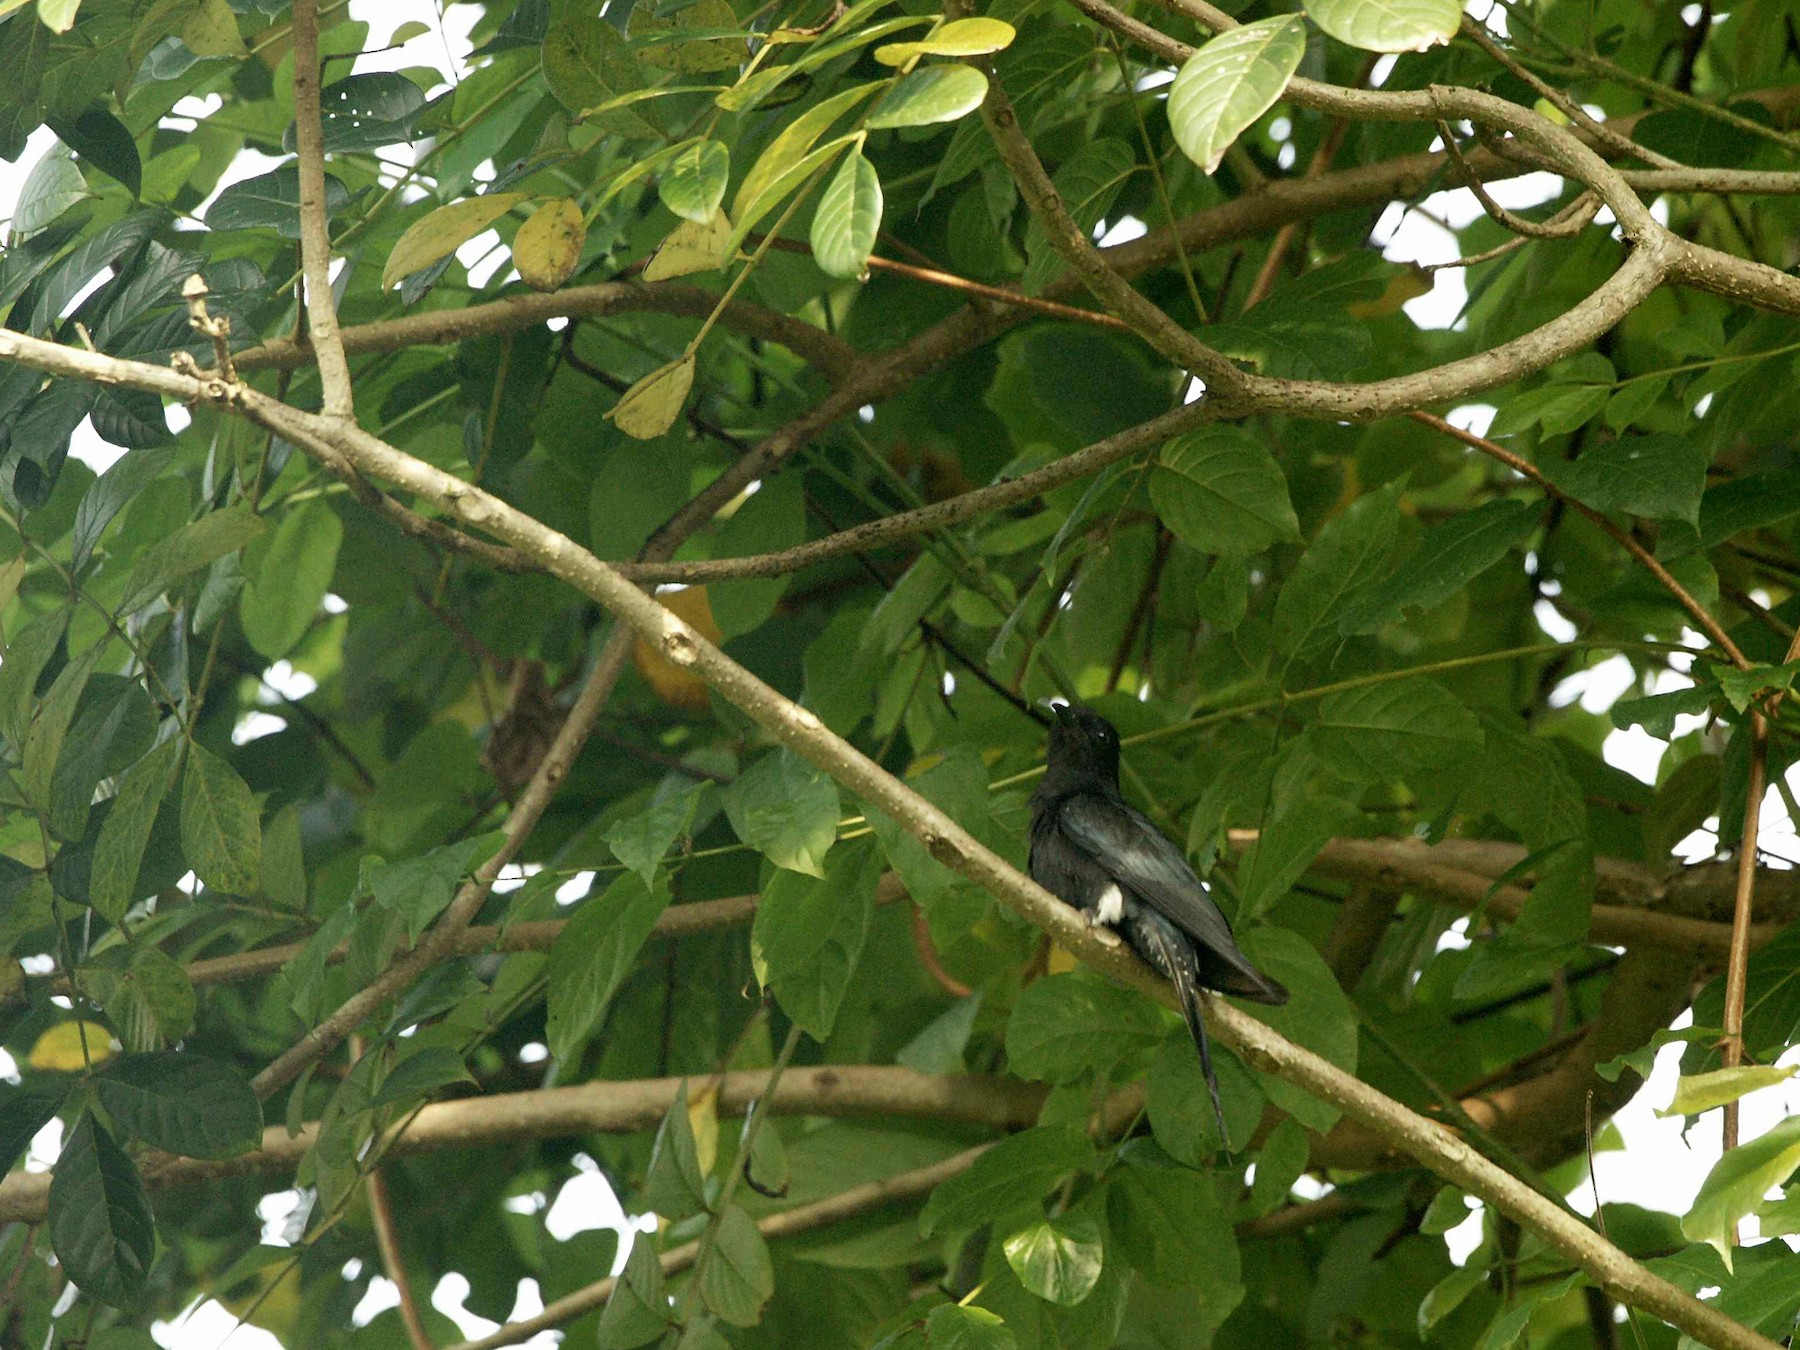 Square-tailed Drongo-Cuckoo - Kian Guan Tay